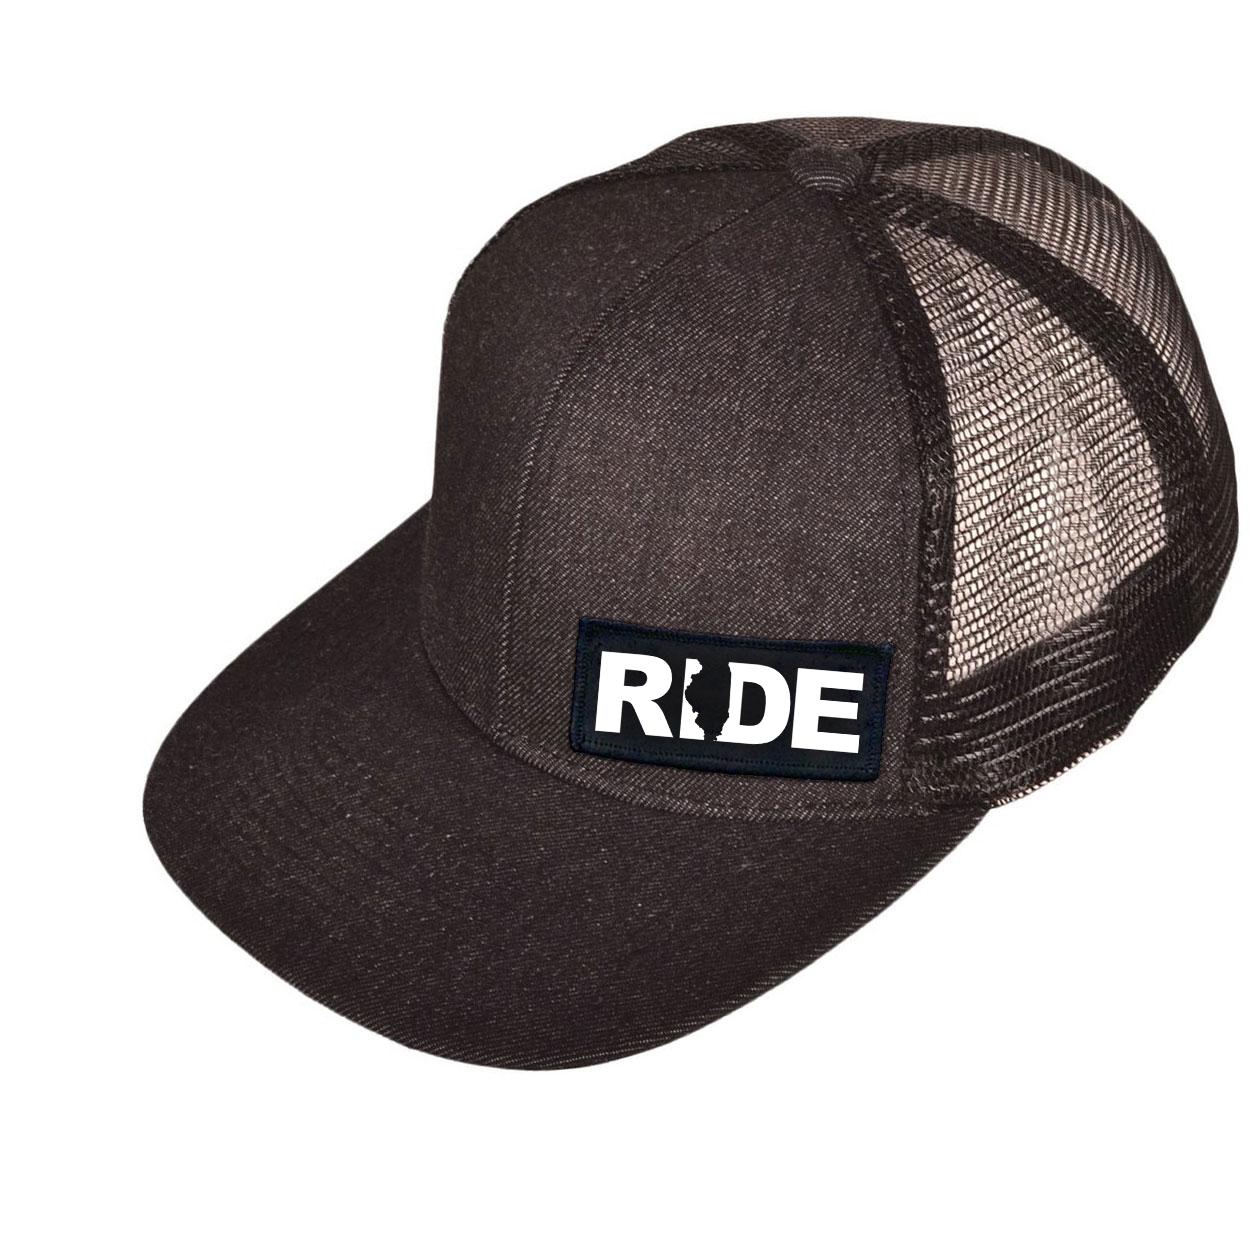 Ride Illinois Night Out Woven Patch Snapback Flat Brim Hat Black Denim (White Logo)